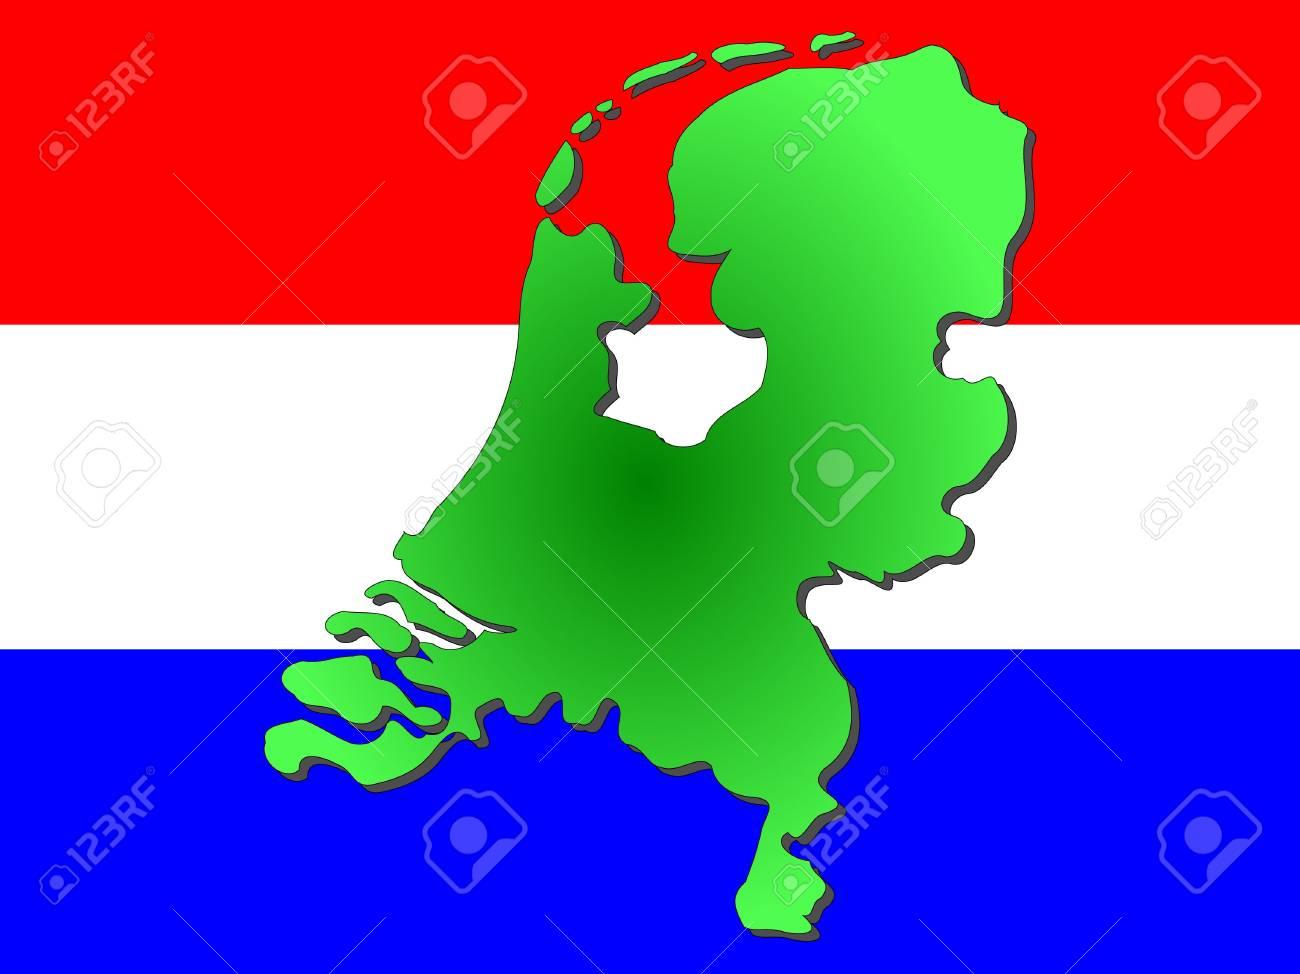 map of Netherlands and dutch flag illustration Stock Illustration - 914401